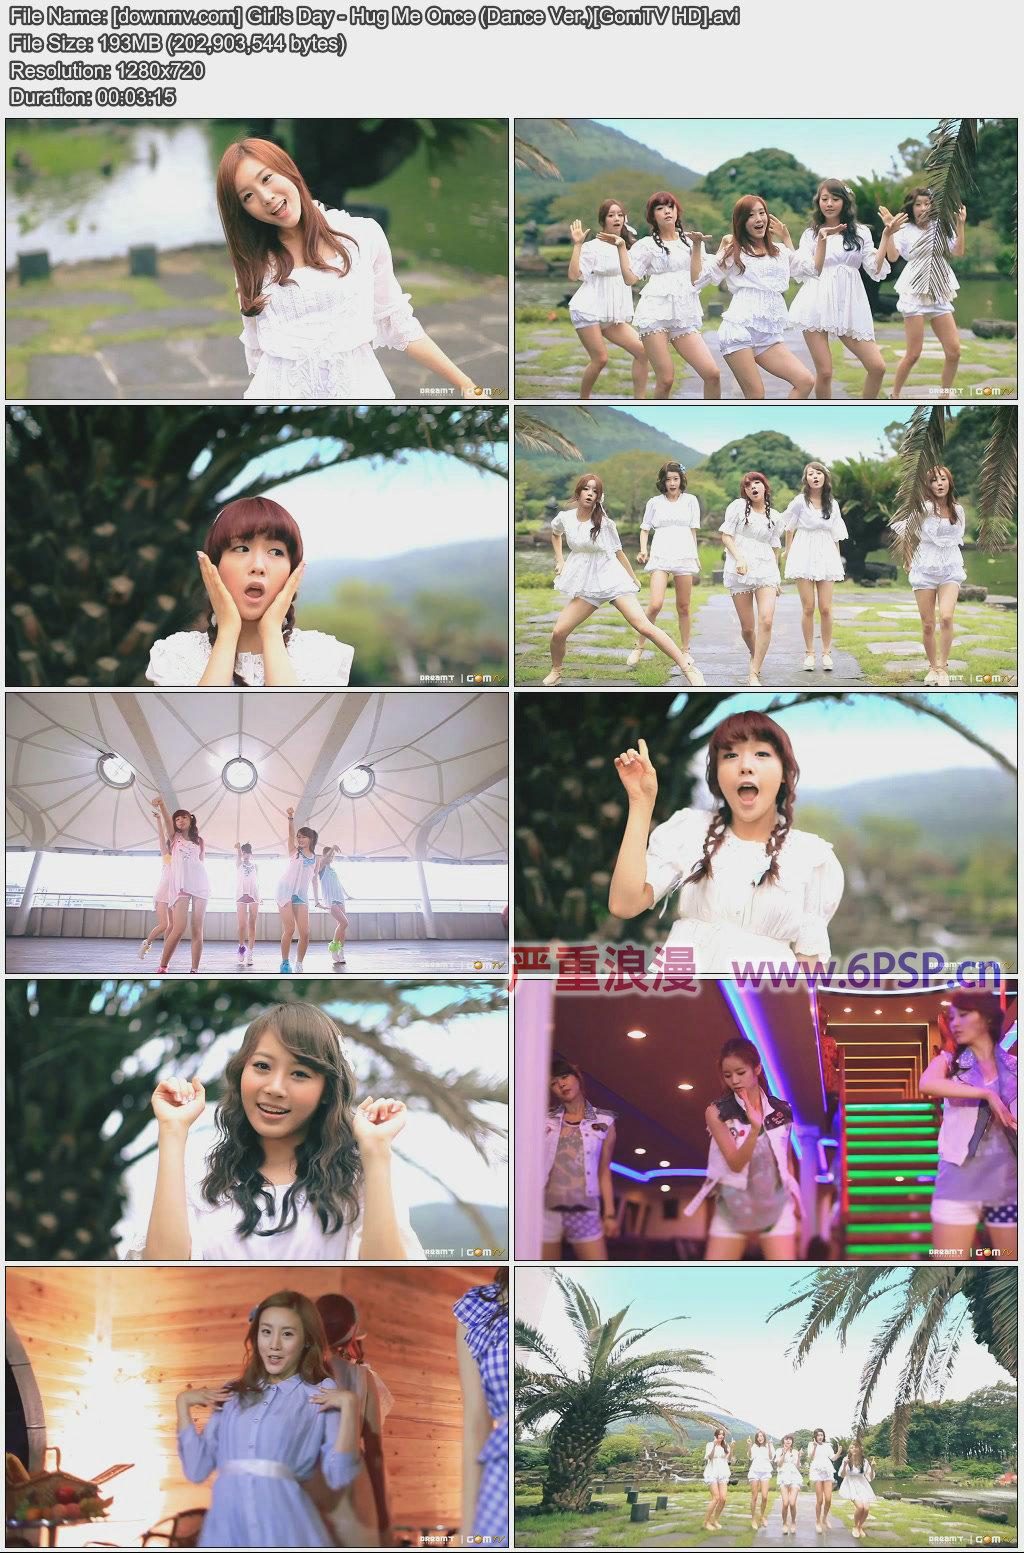 Girl's Day - [Hug Me Once(Dance Ver.)/再抱我一次-舞蹈版